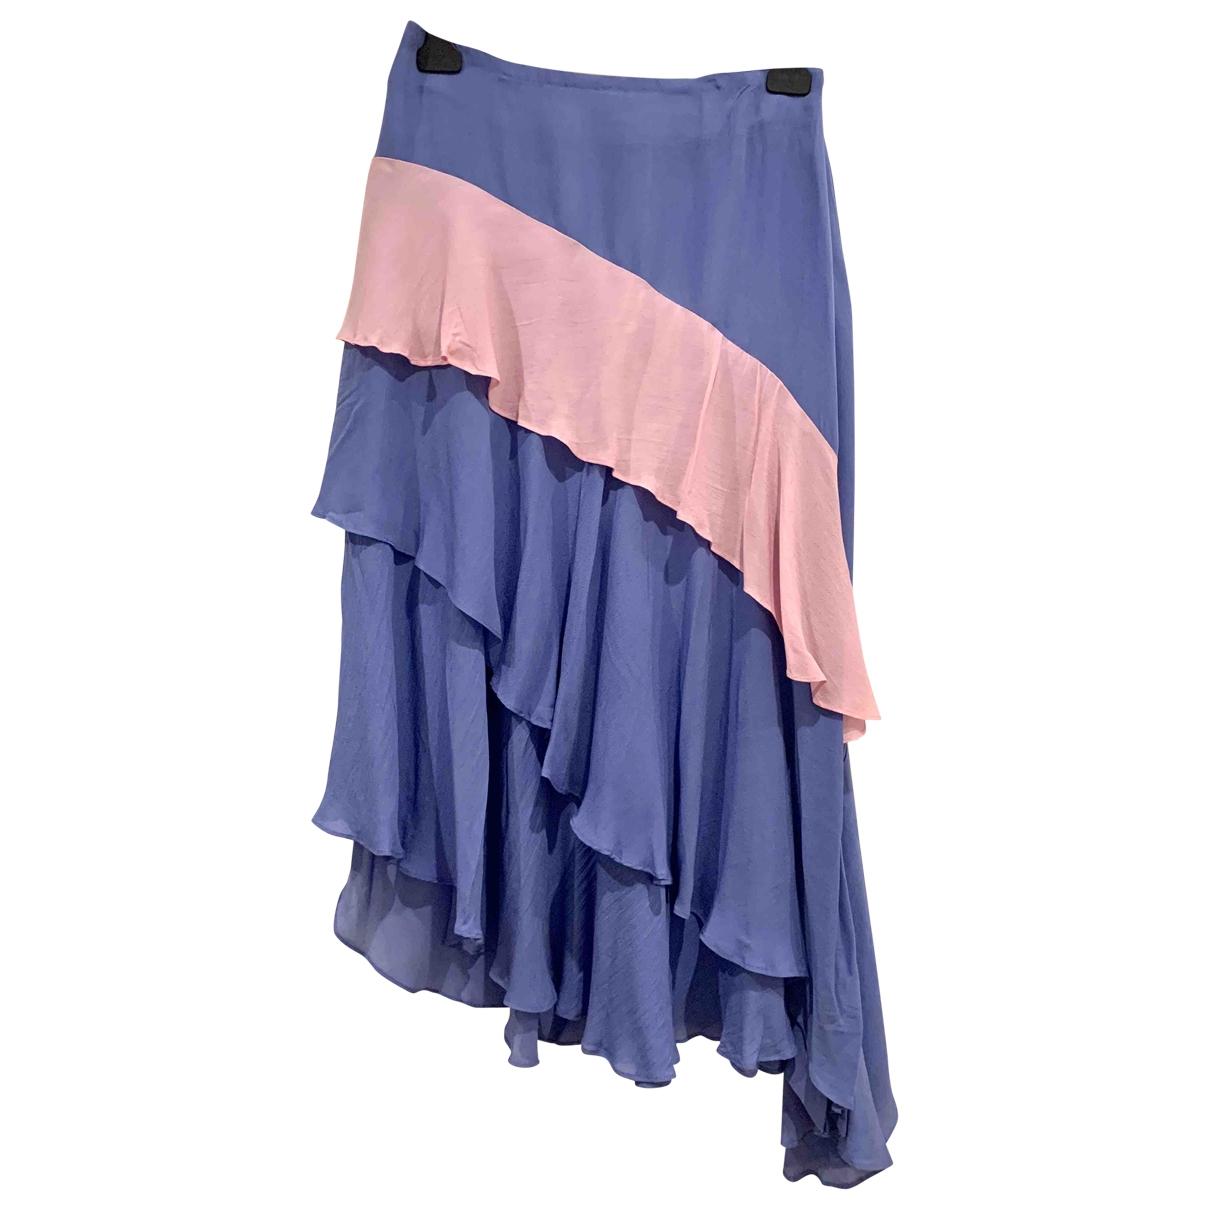 Preen - Jupe   pour femme - multicolore